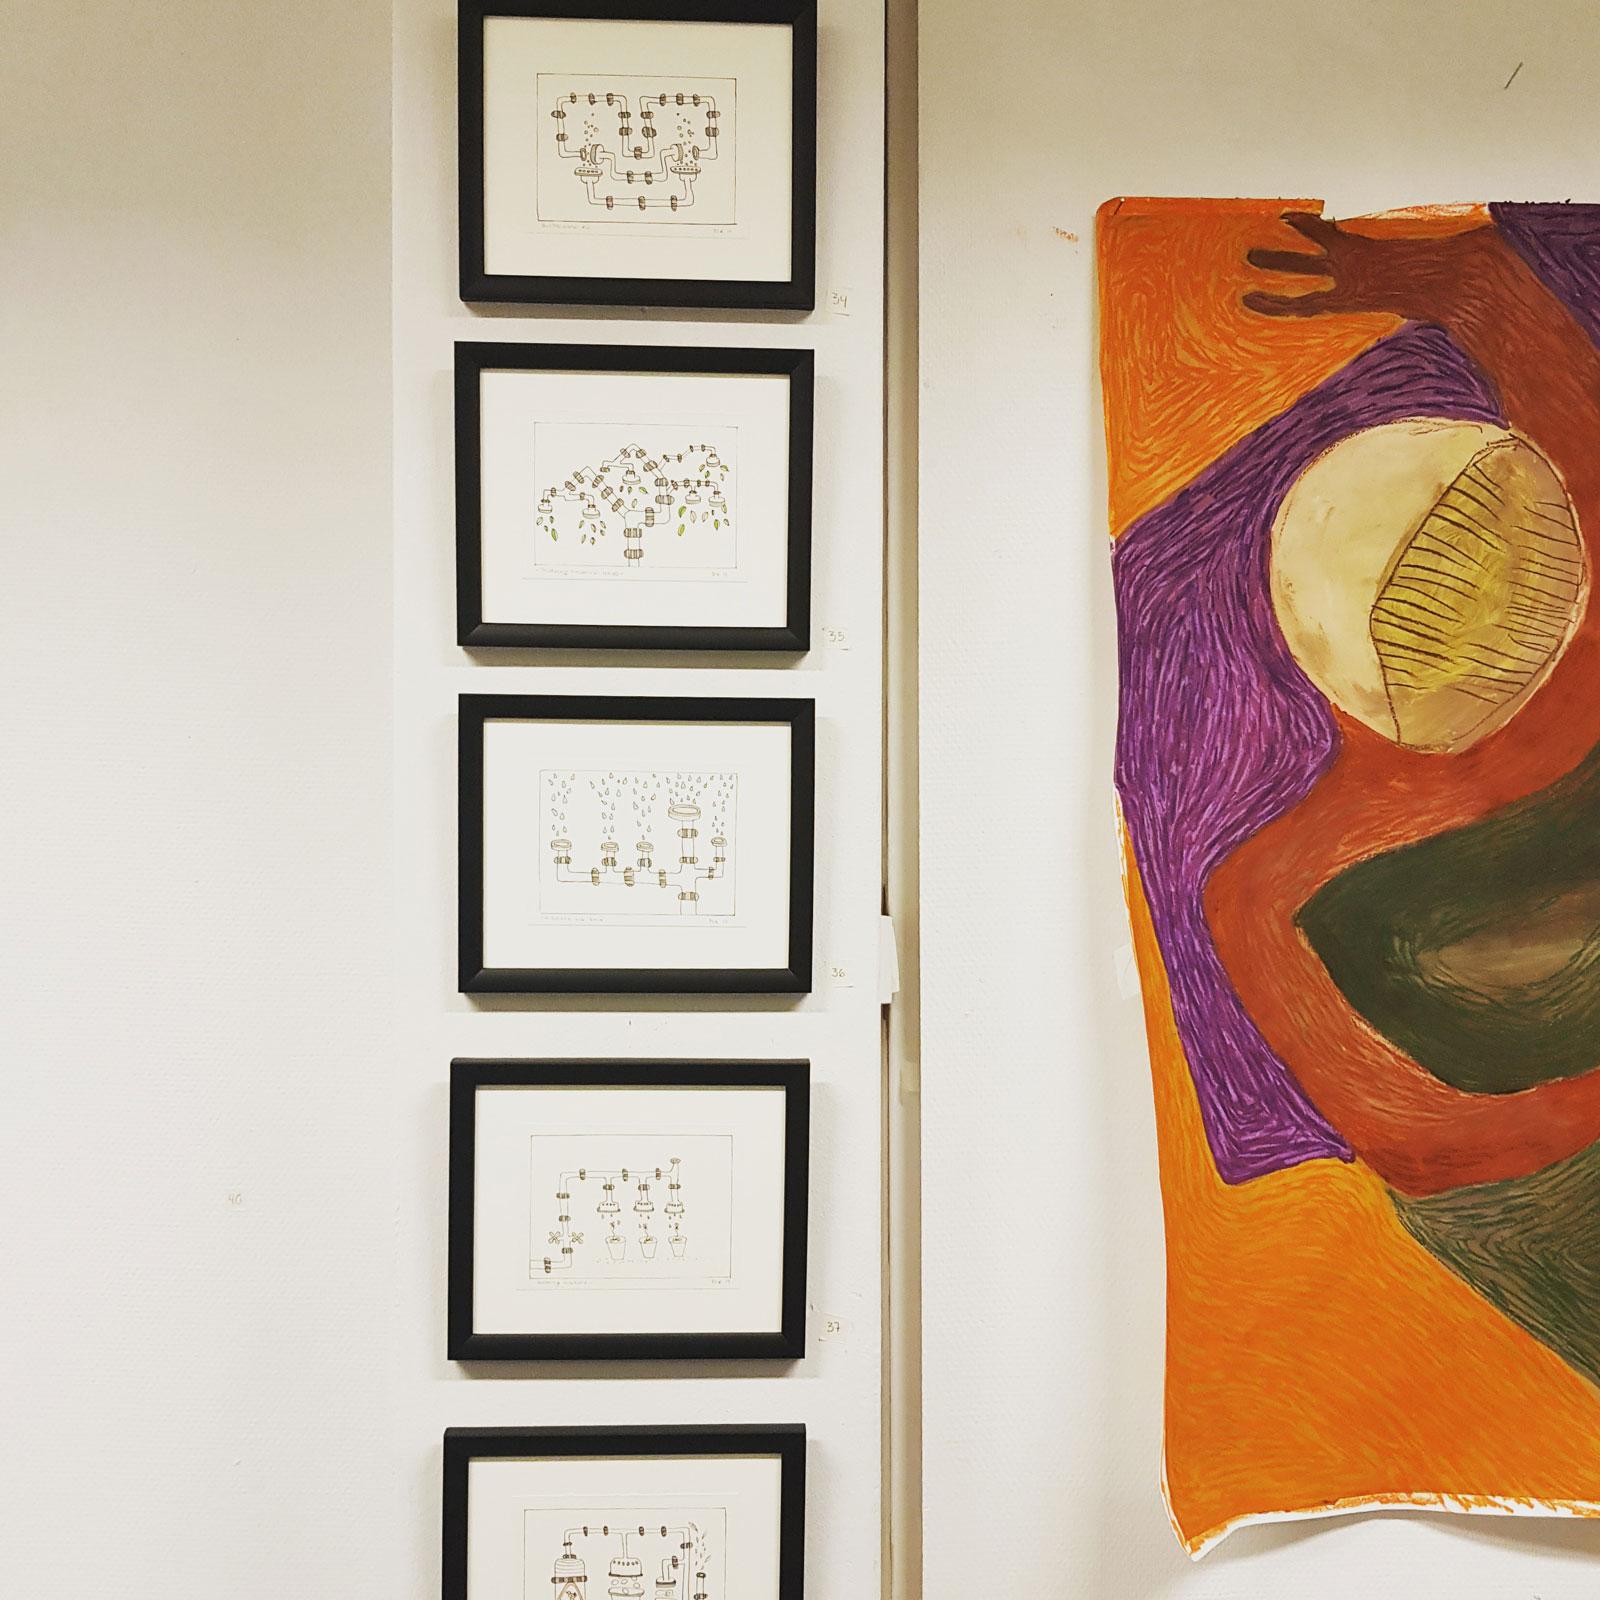 Det Tverrfaglige Kunstinstitutt - Kunstfagskolen i Bærum